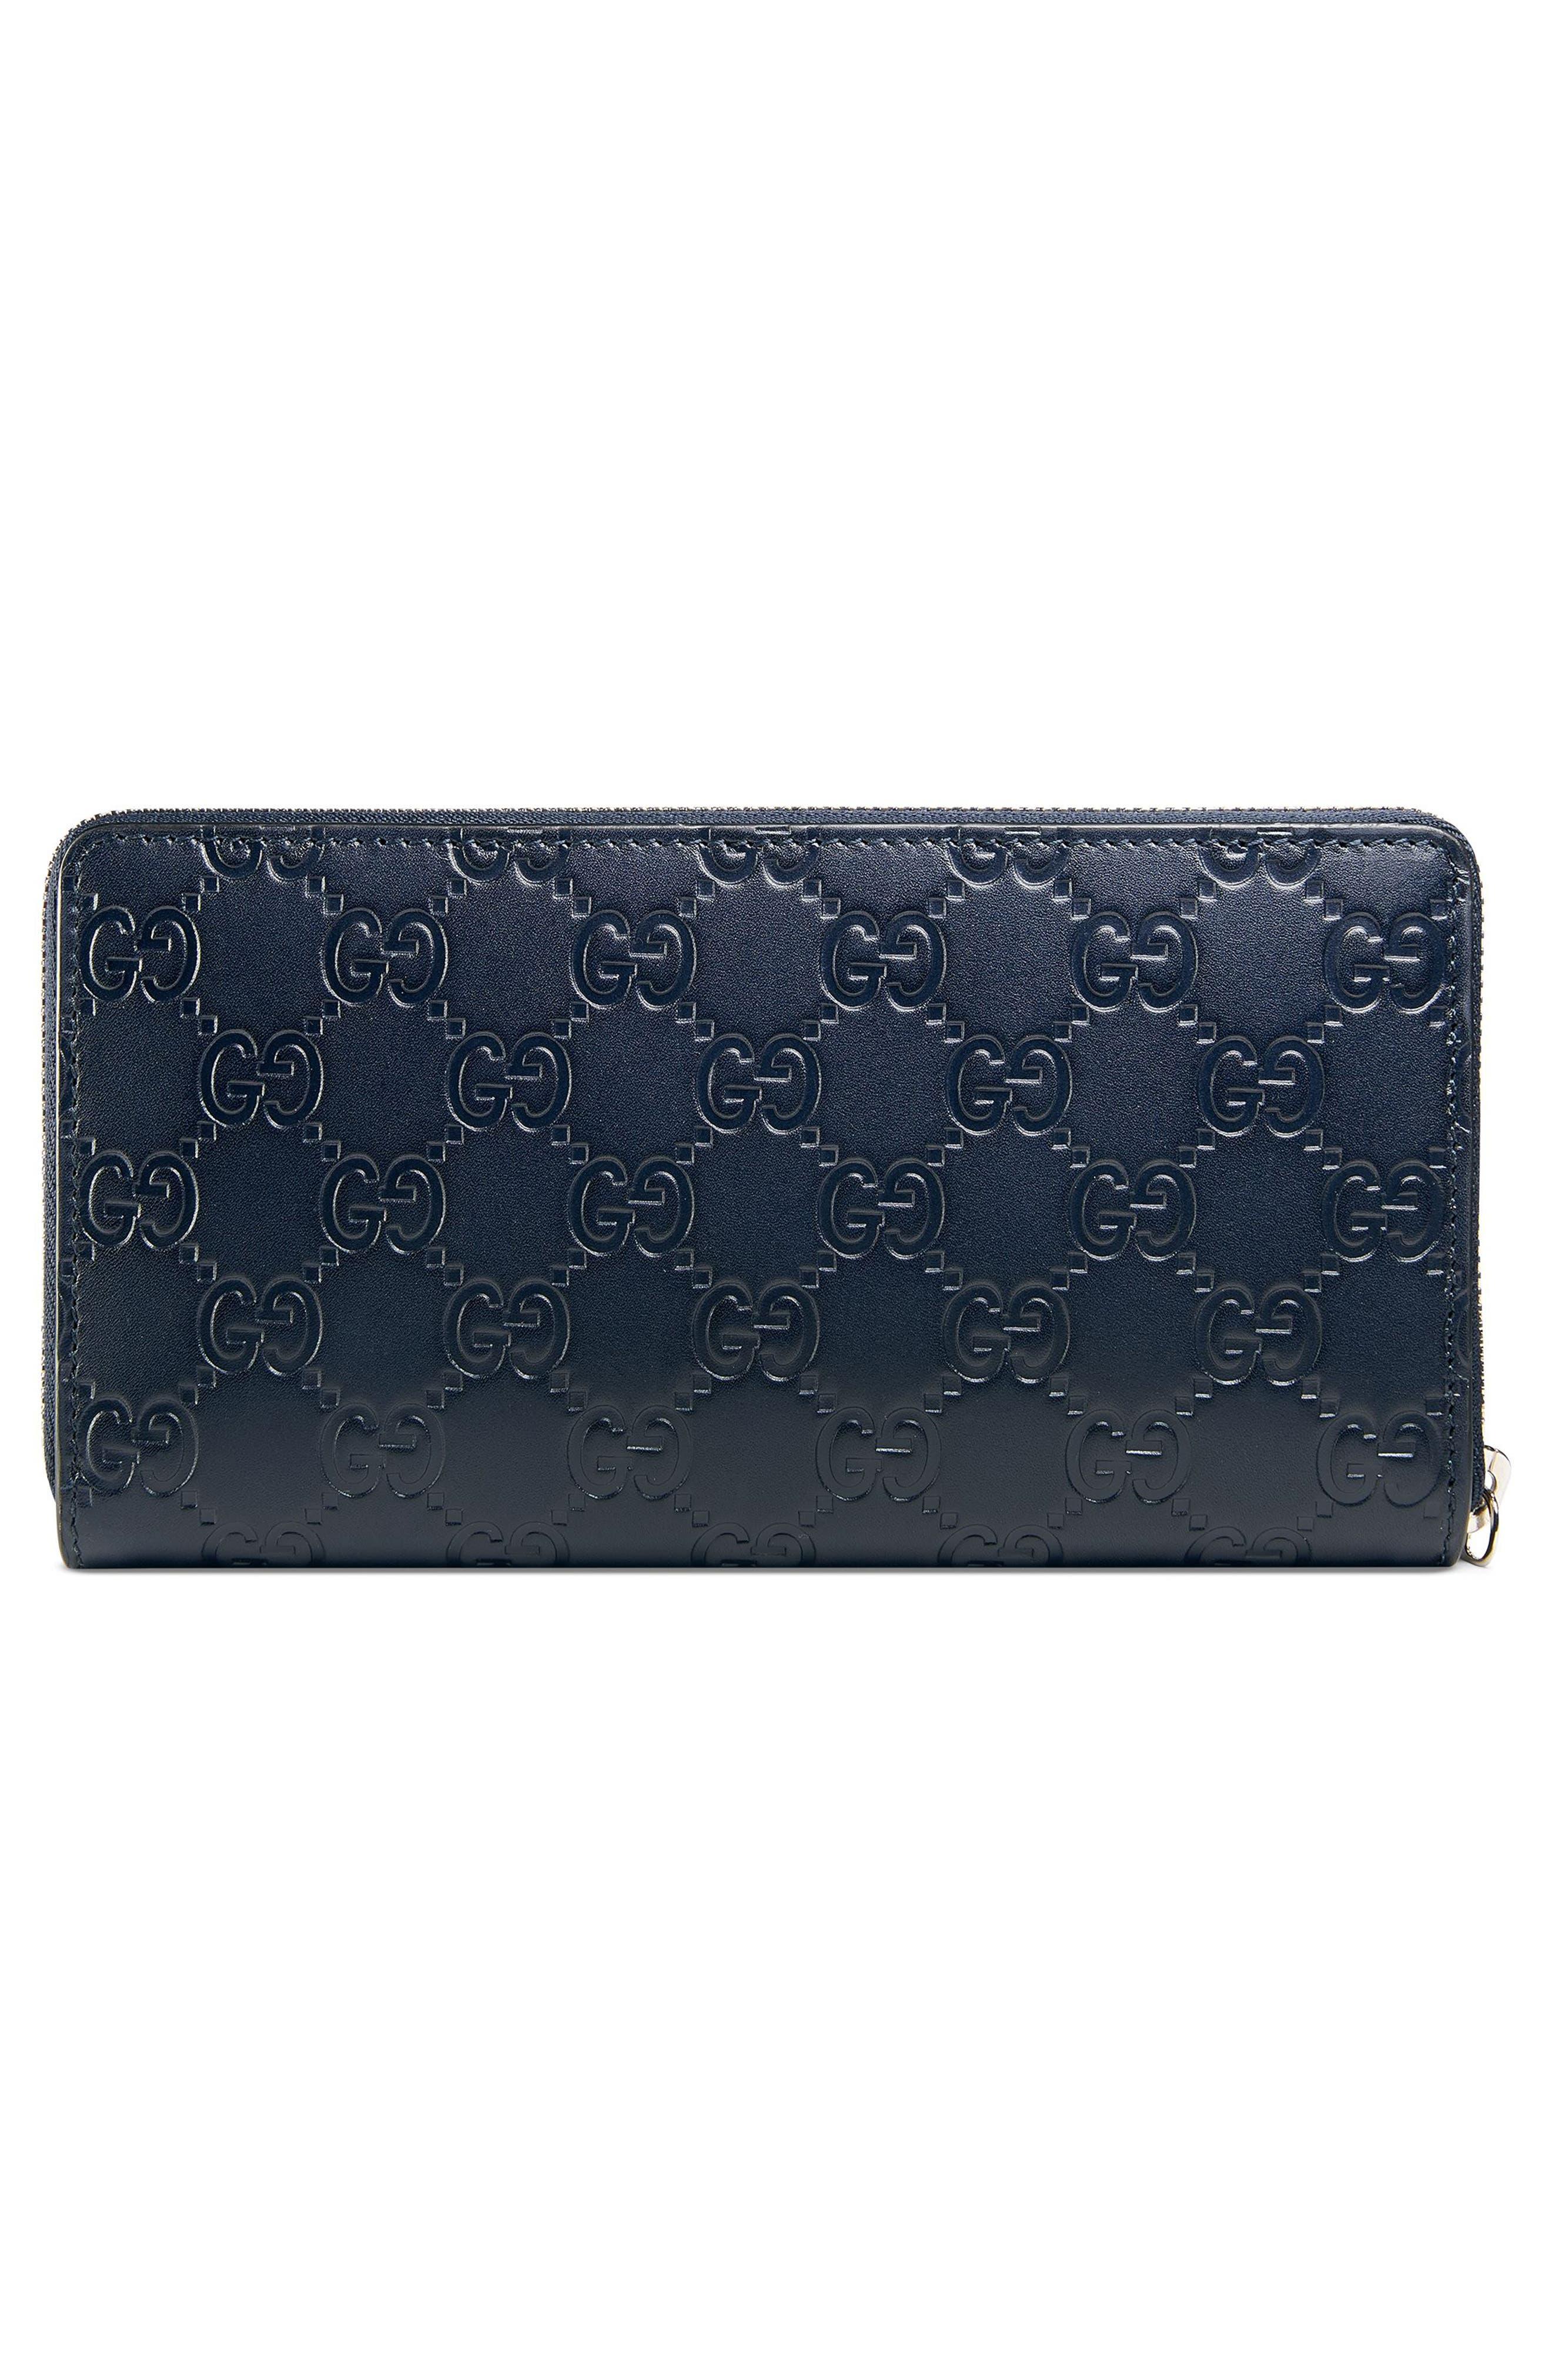 Dorian Leather Wallet,                             Alternate thumbnail 2, color,                             Blue